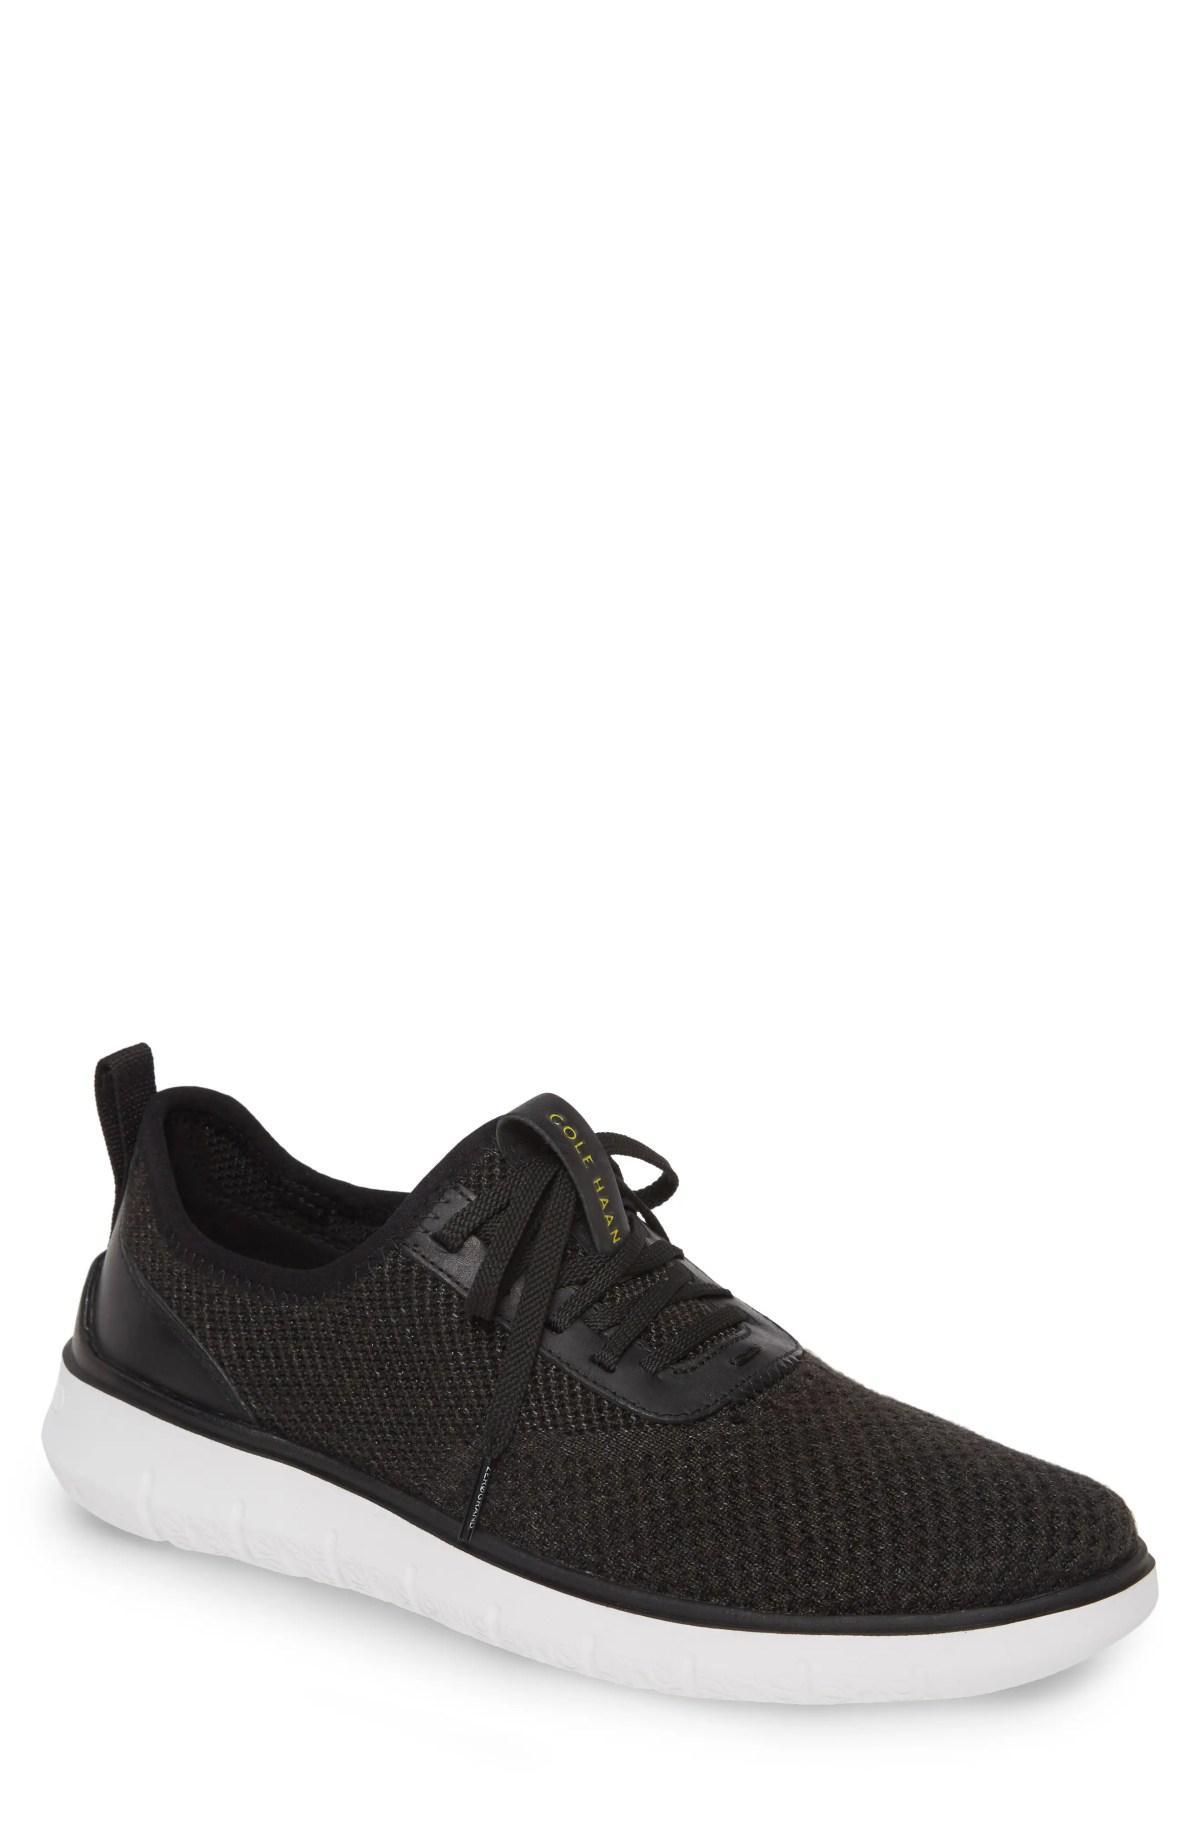 COLE HAAN Generation ZeroGrand Stitchlite Sneaker, Main, color, BLACK STITCHLITE / OPTIC WHITE